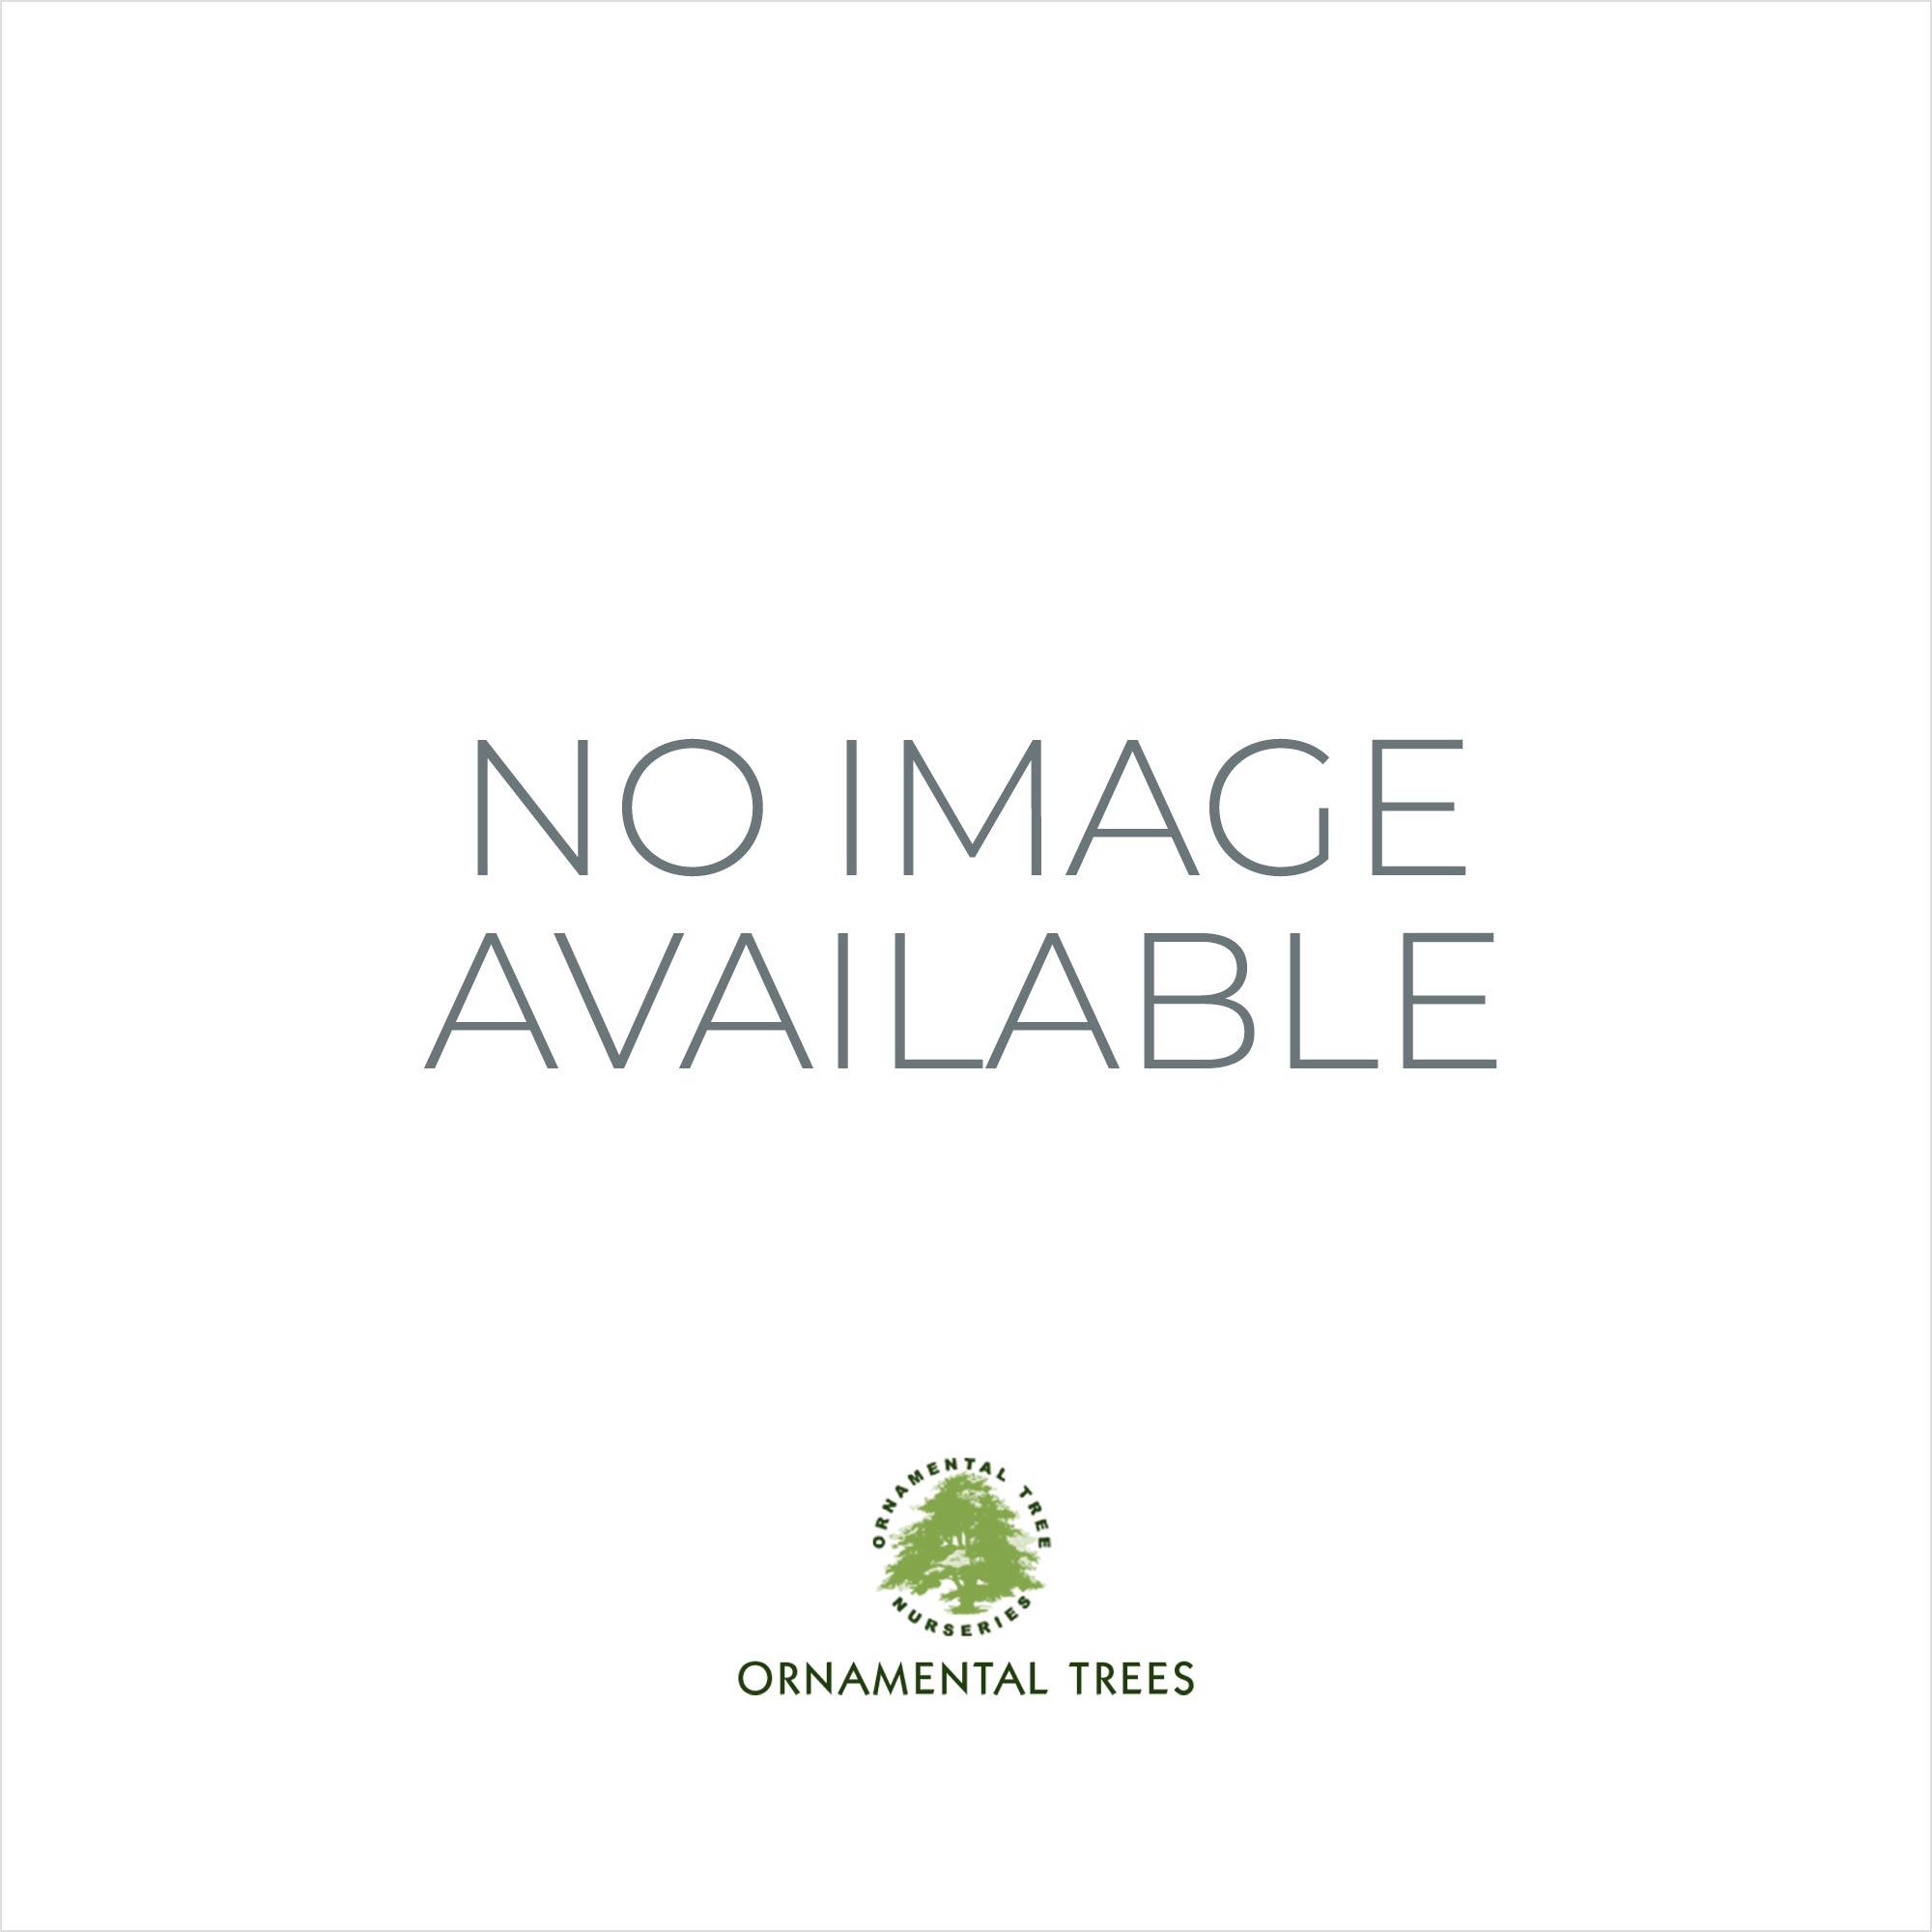 prunus lusitanica portuguese laurel ornamental tree. Black Bedroom Furniture Sets. Home Design Ideas